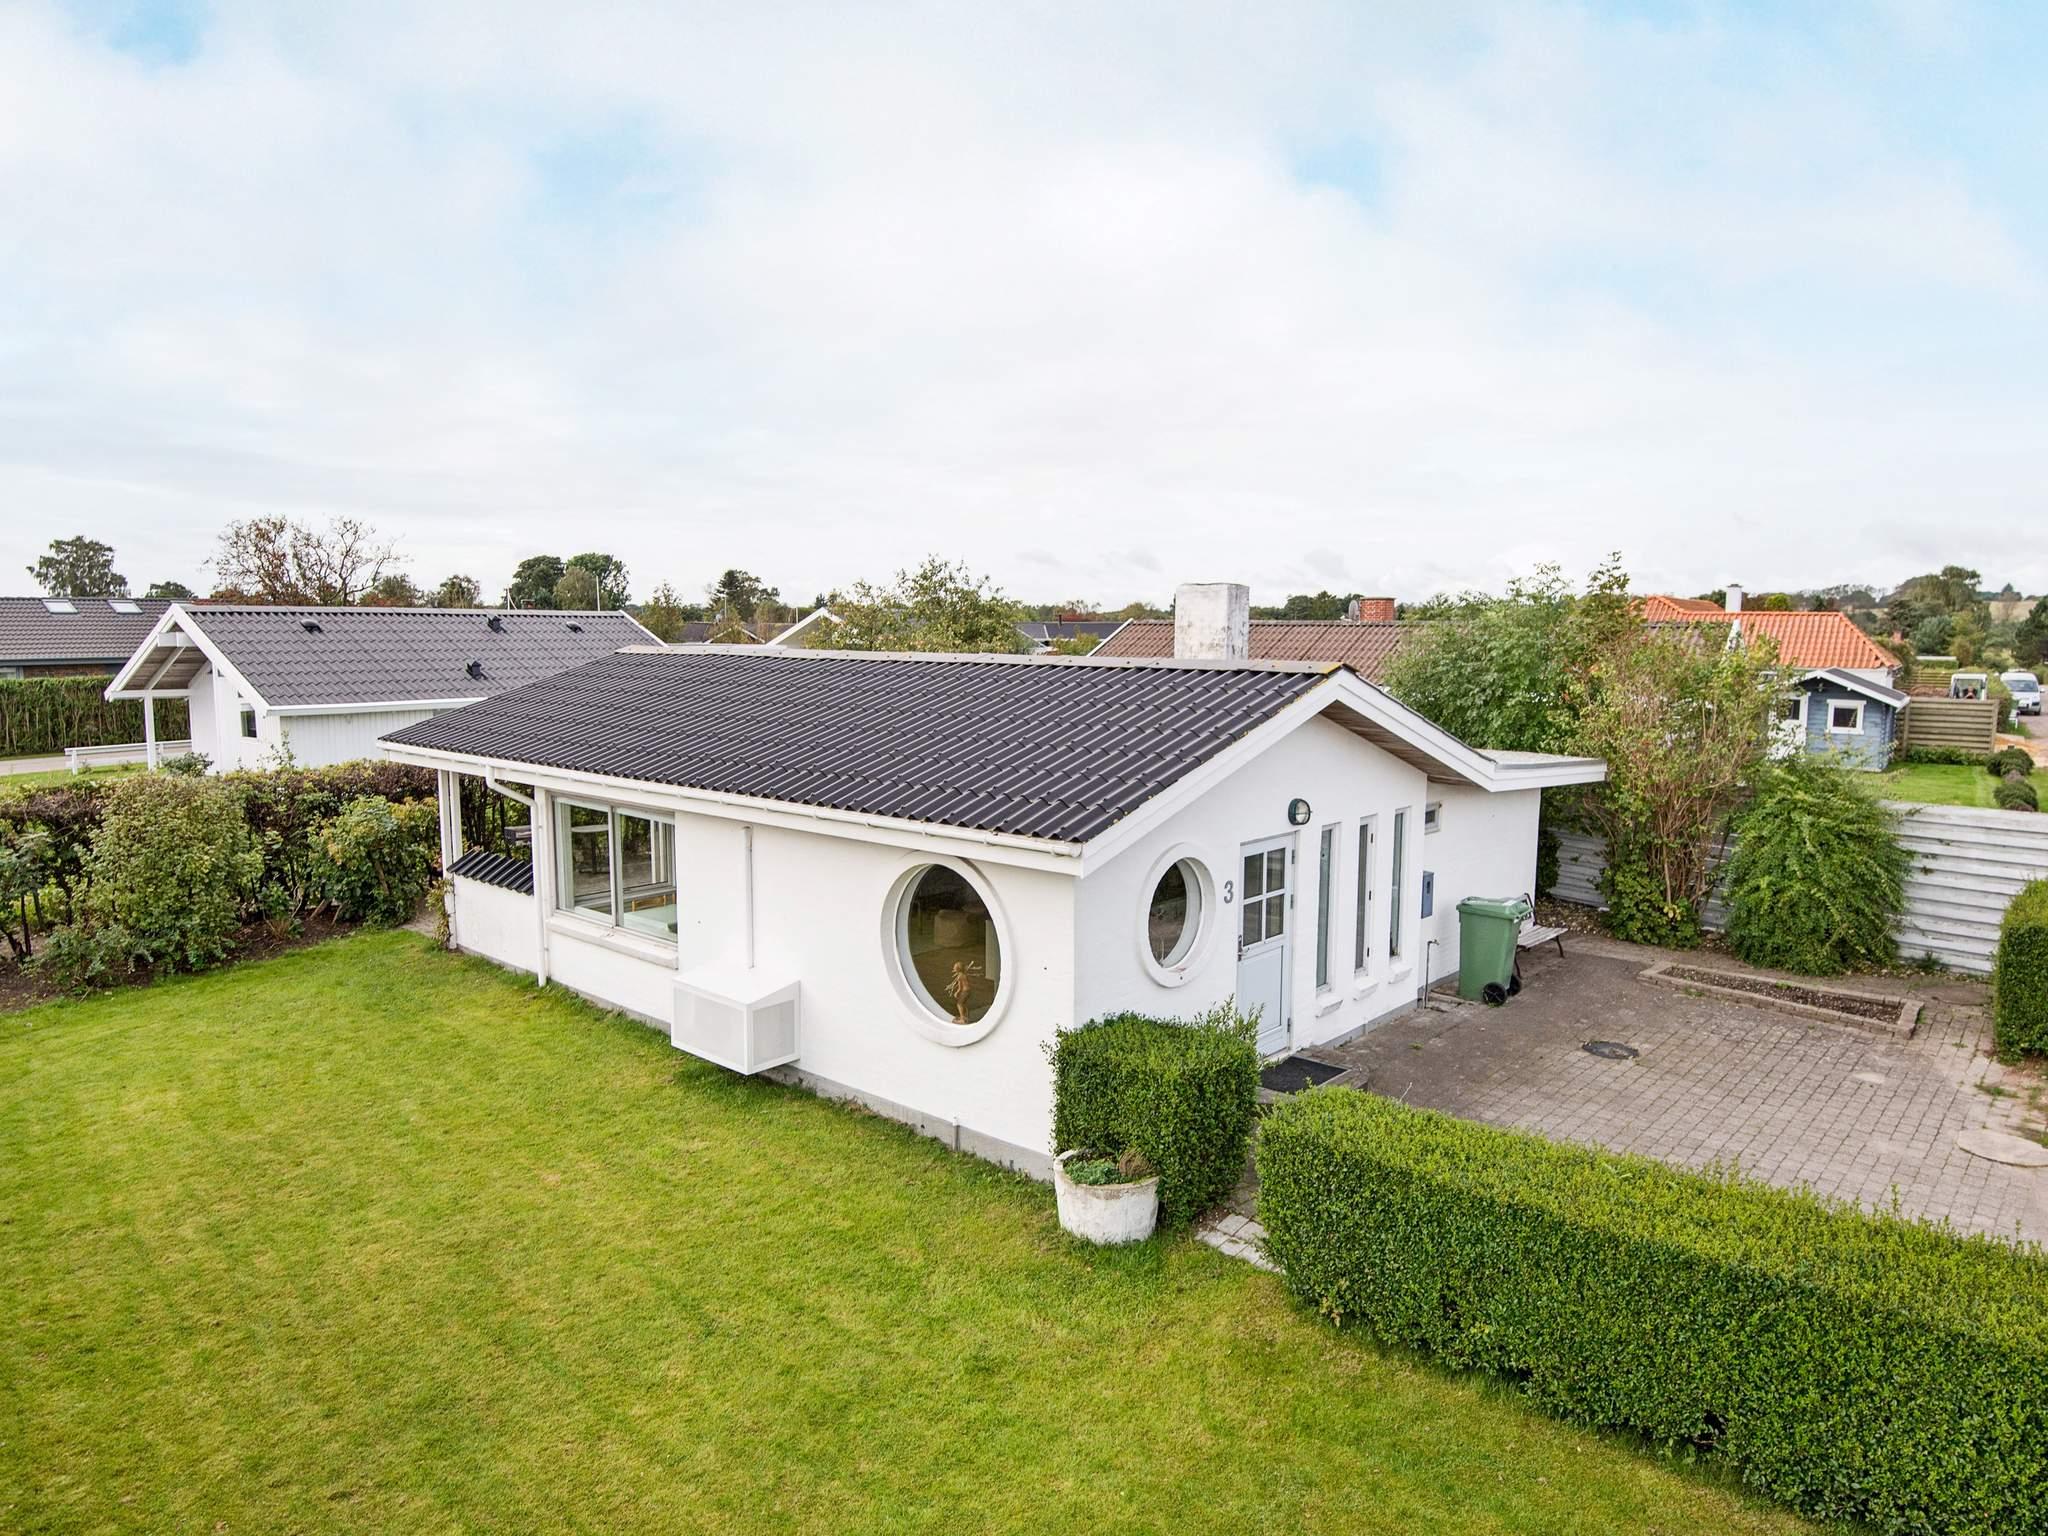 Ferienhaus Ajstrup Strand/Malling (2355032), Ajstrup, , Dänische Ostsee, Dänemark, Bild 1